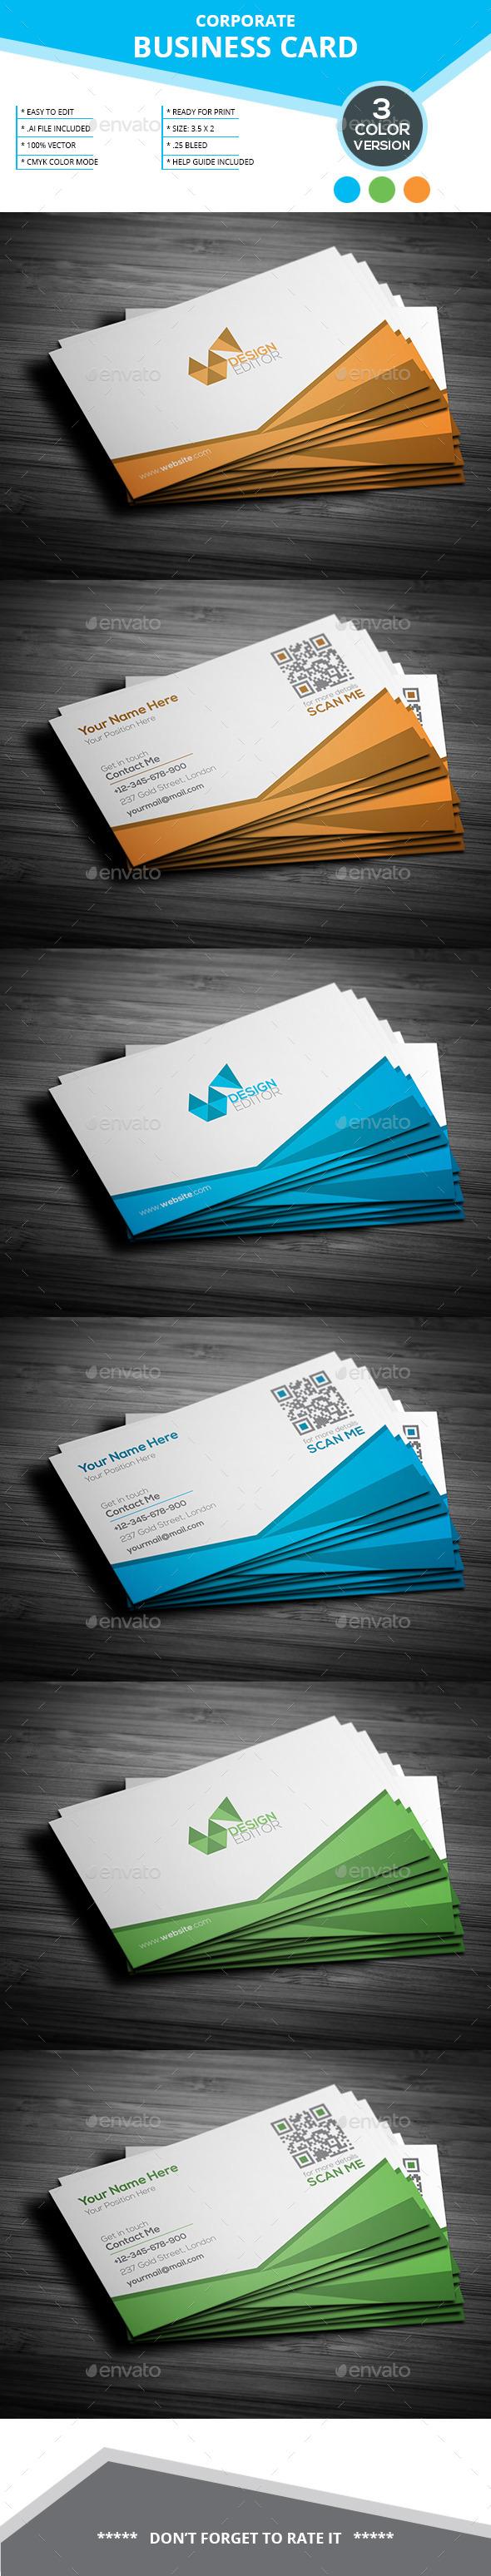 Corporate Business Card SL 31